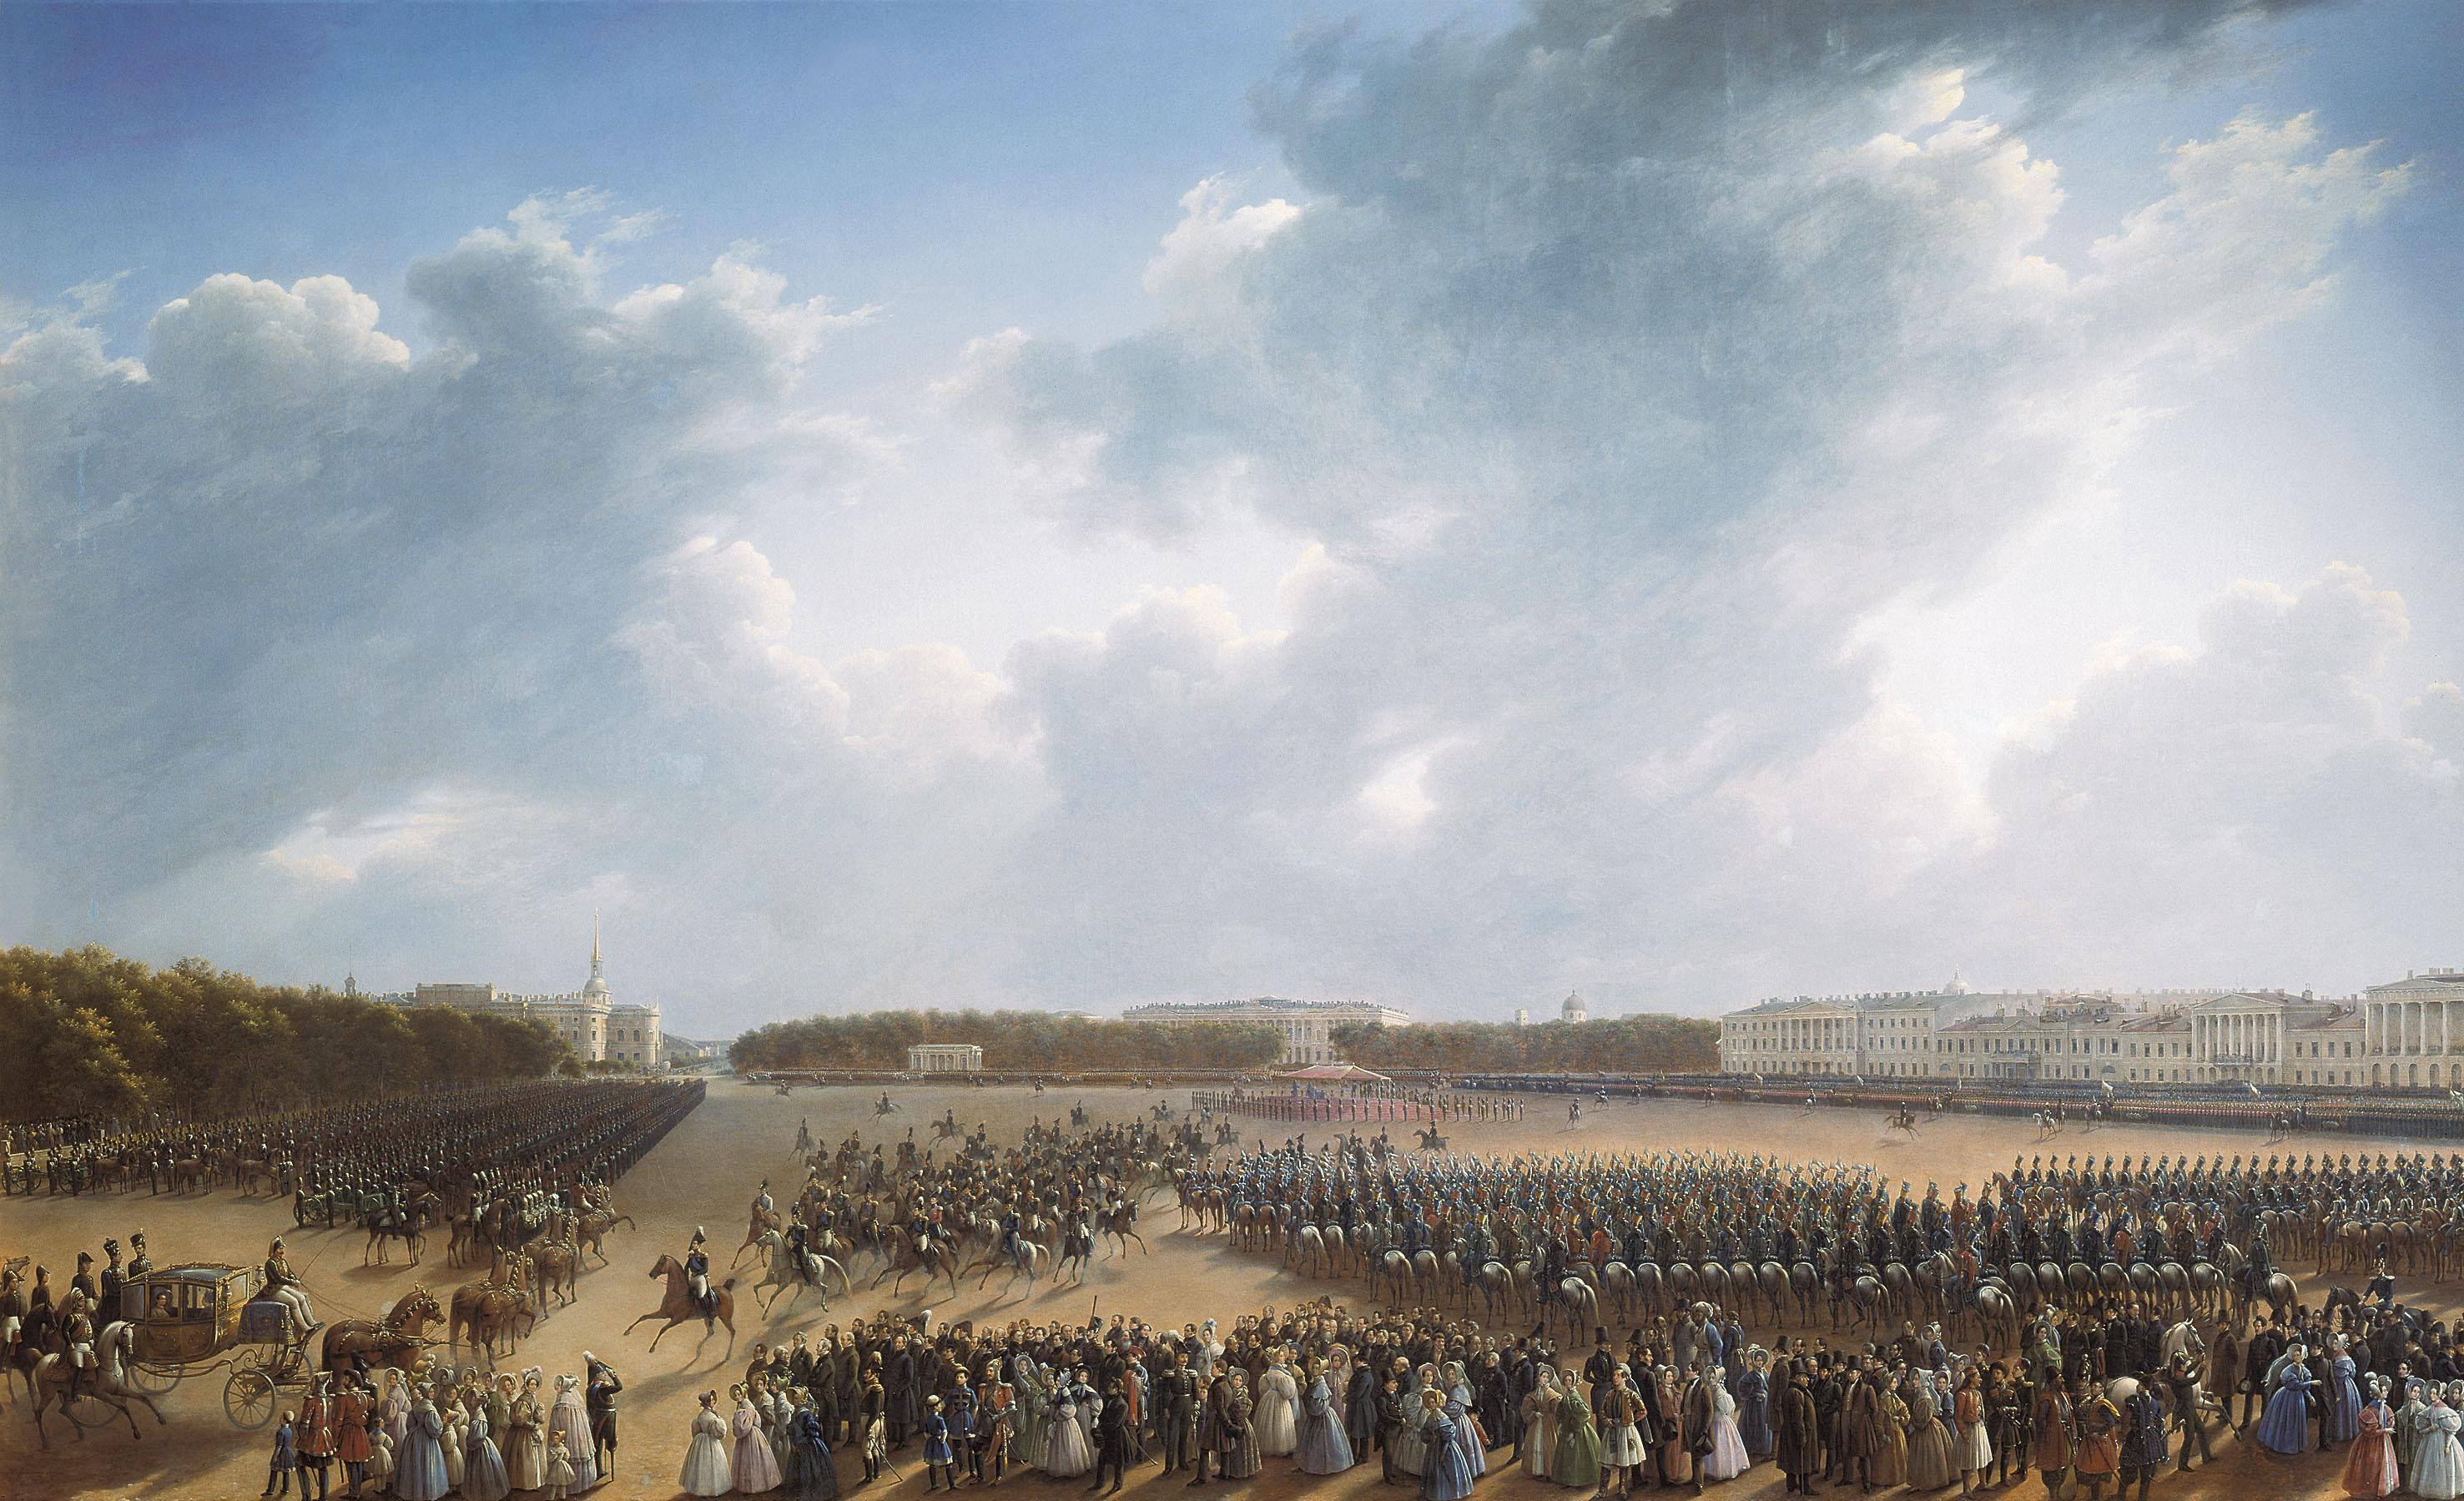 Парад на Царицыном лугу в 1831 г. Худ. Г. Чернецов. 1837 г.